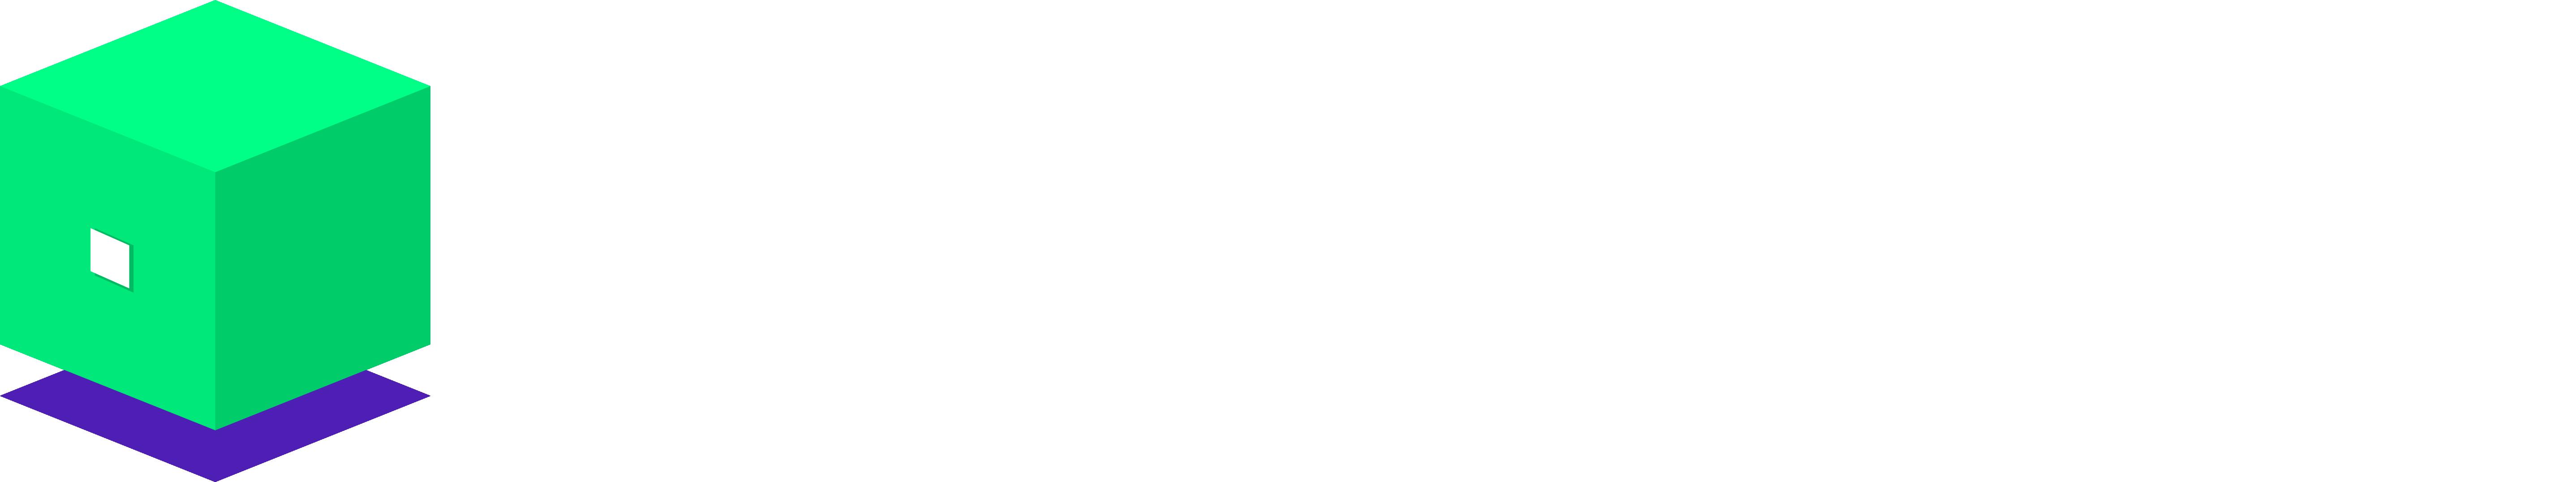 GamerHost.pro - Panel